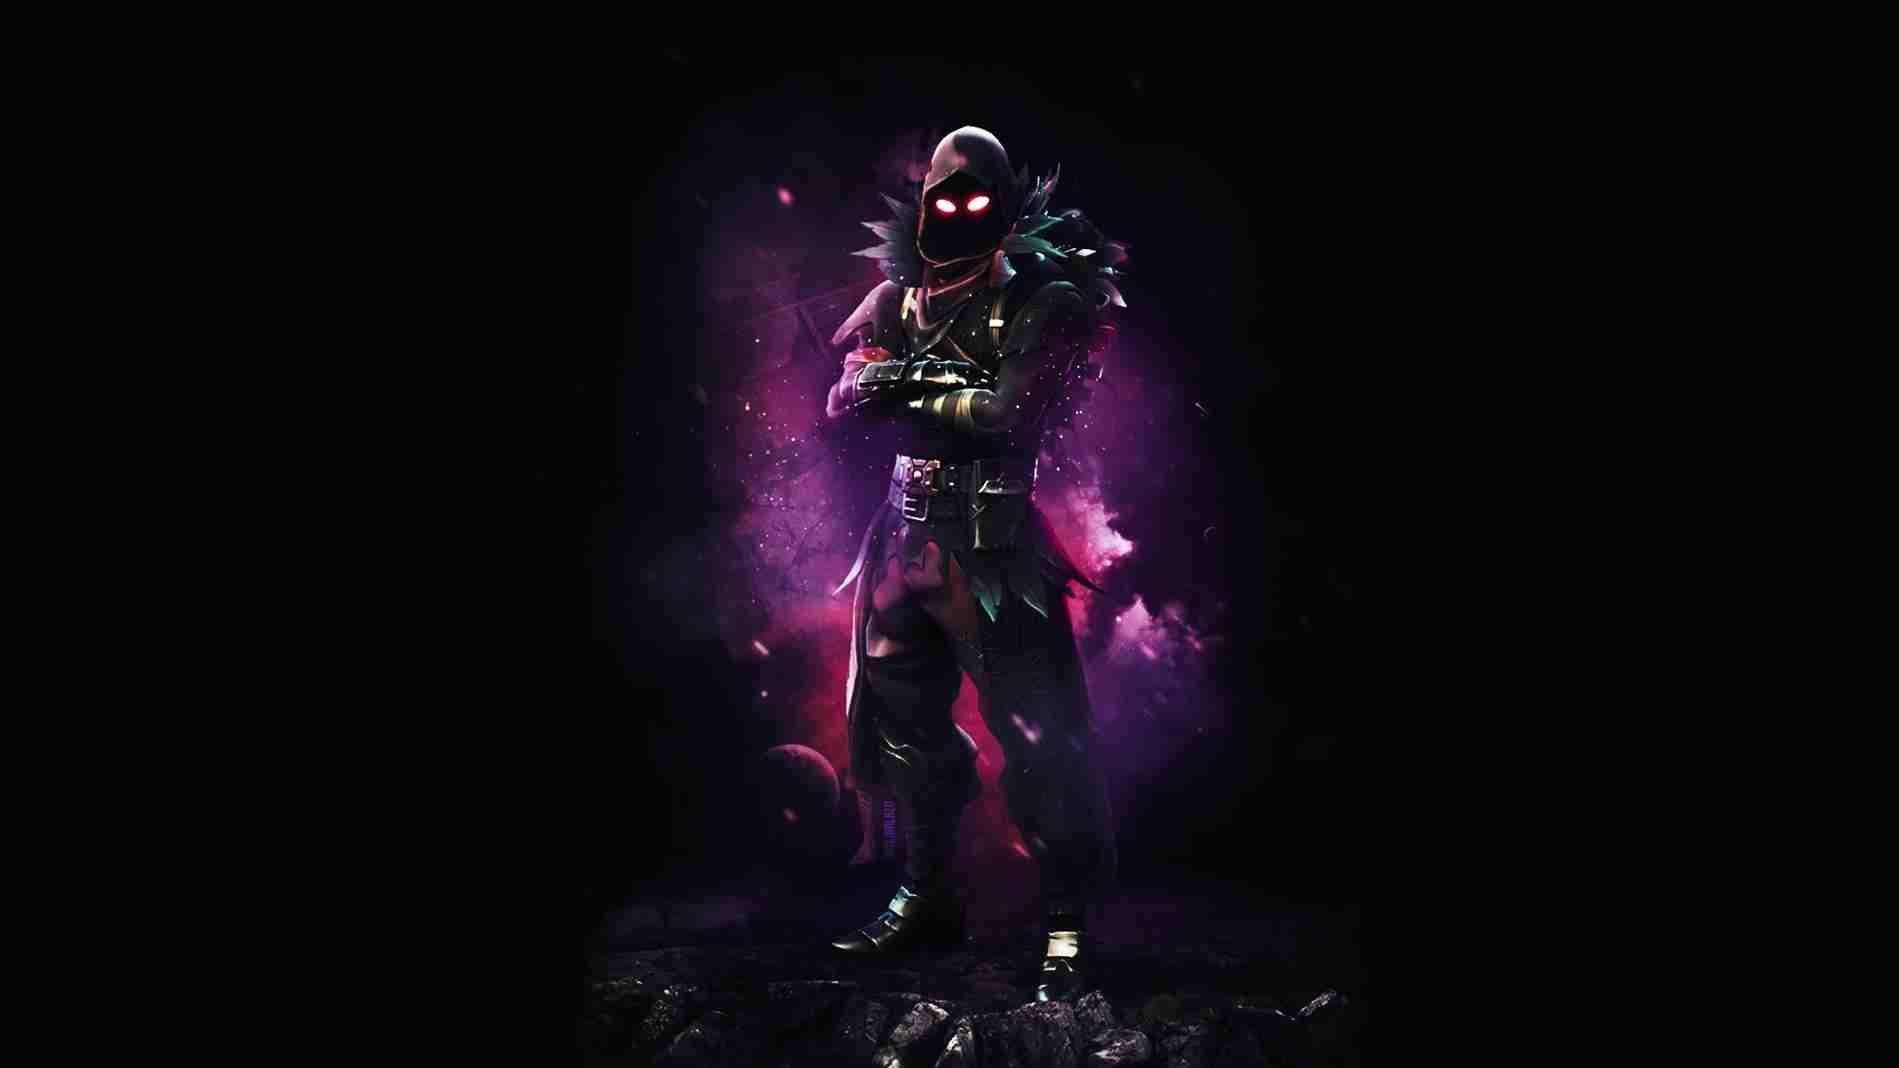 Fortnite Ninja Wallpapers: Ninja Fortnite HD Wallpapers